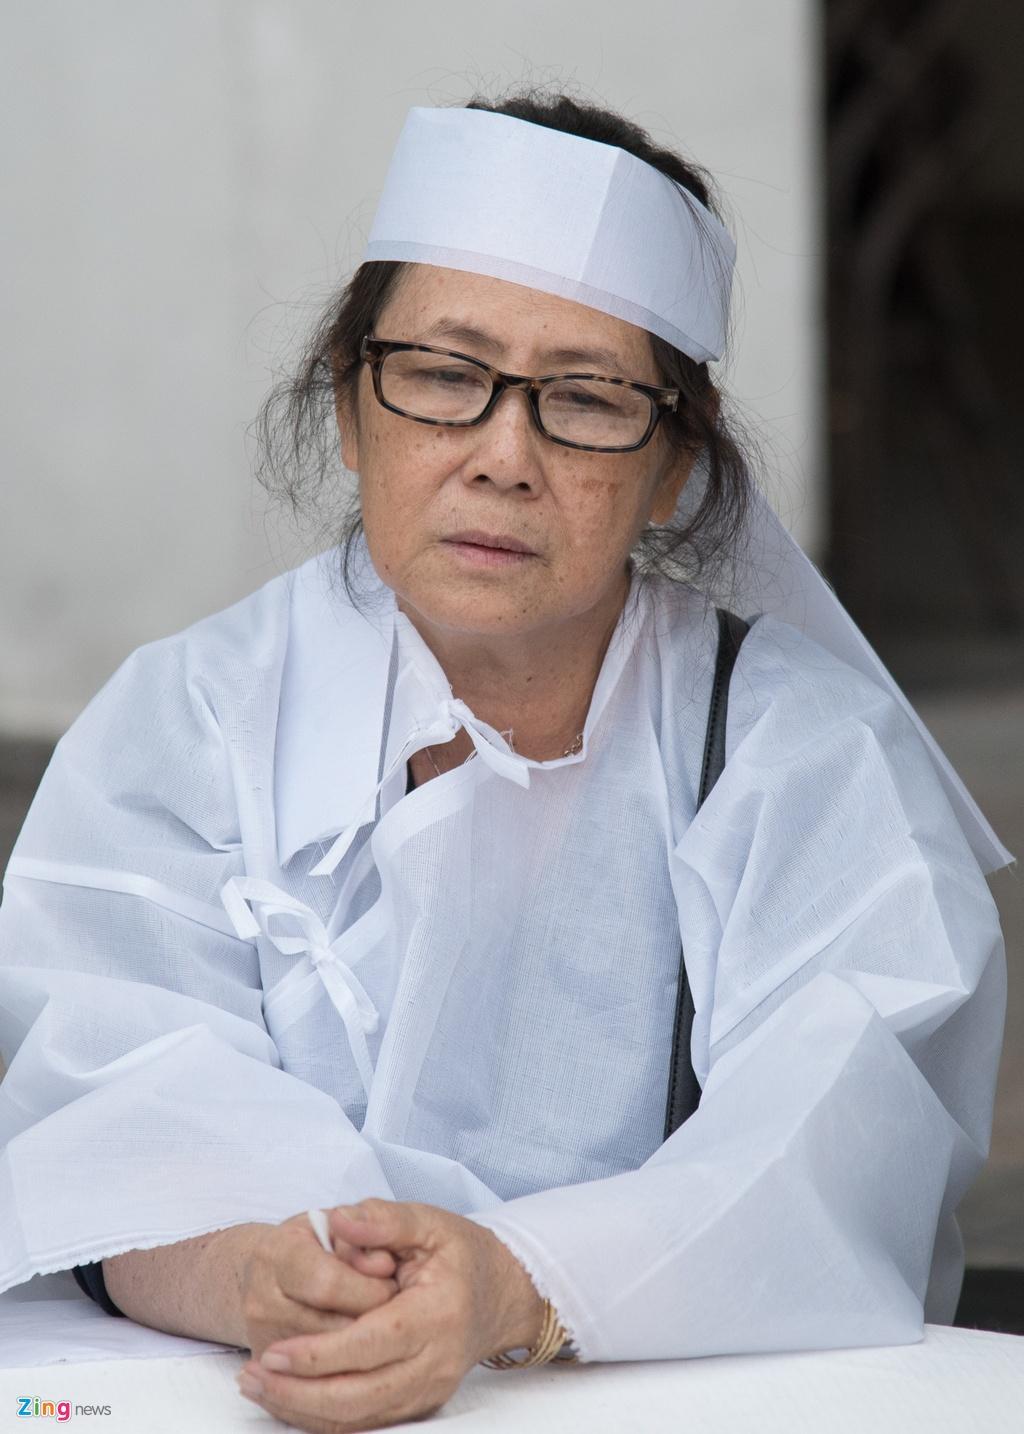 Quyen Linh, Phuong Thanh vieng dien vien Nguyen Hau vao ngay 29 Tet hinh anh 2